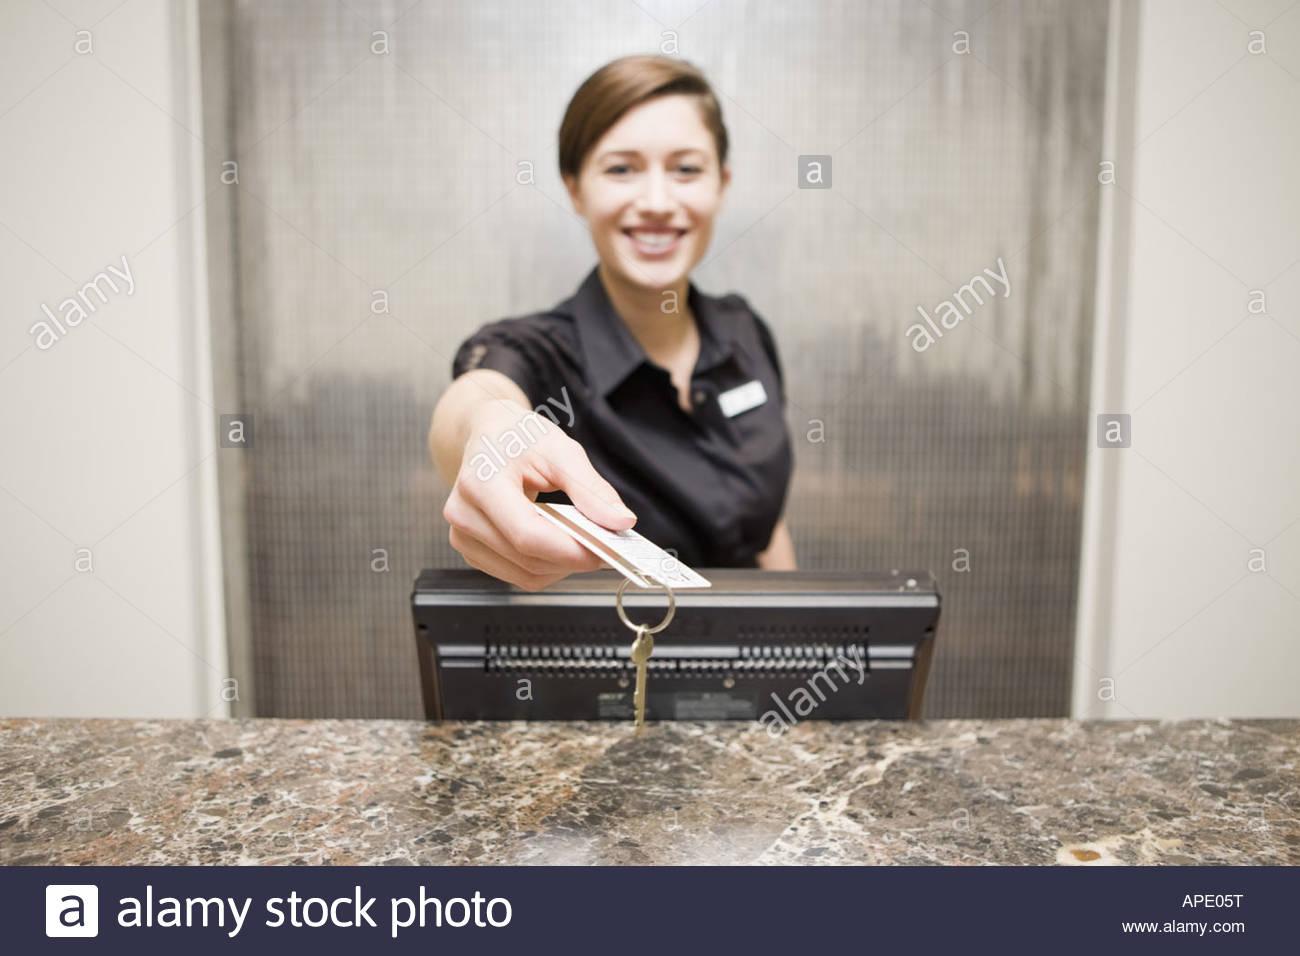 Female hotel front desk clerk handing keycard Stock Photo Royalty Free Image 15761603  Alamy